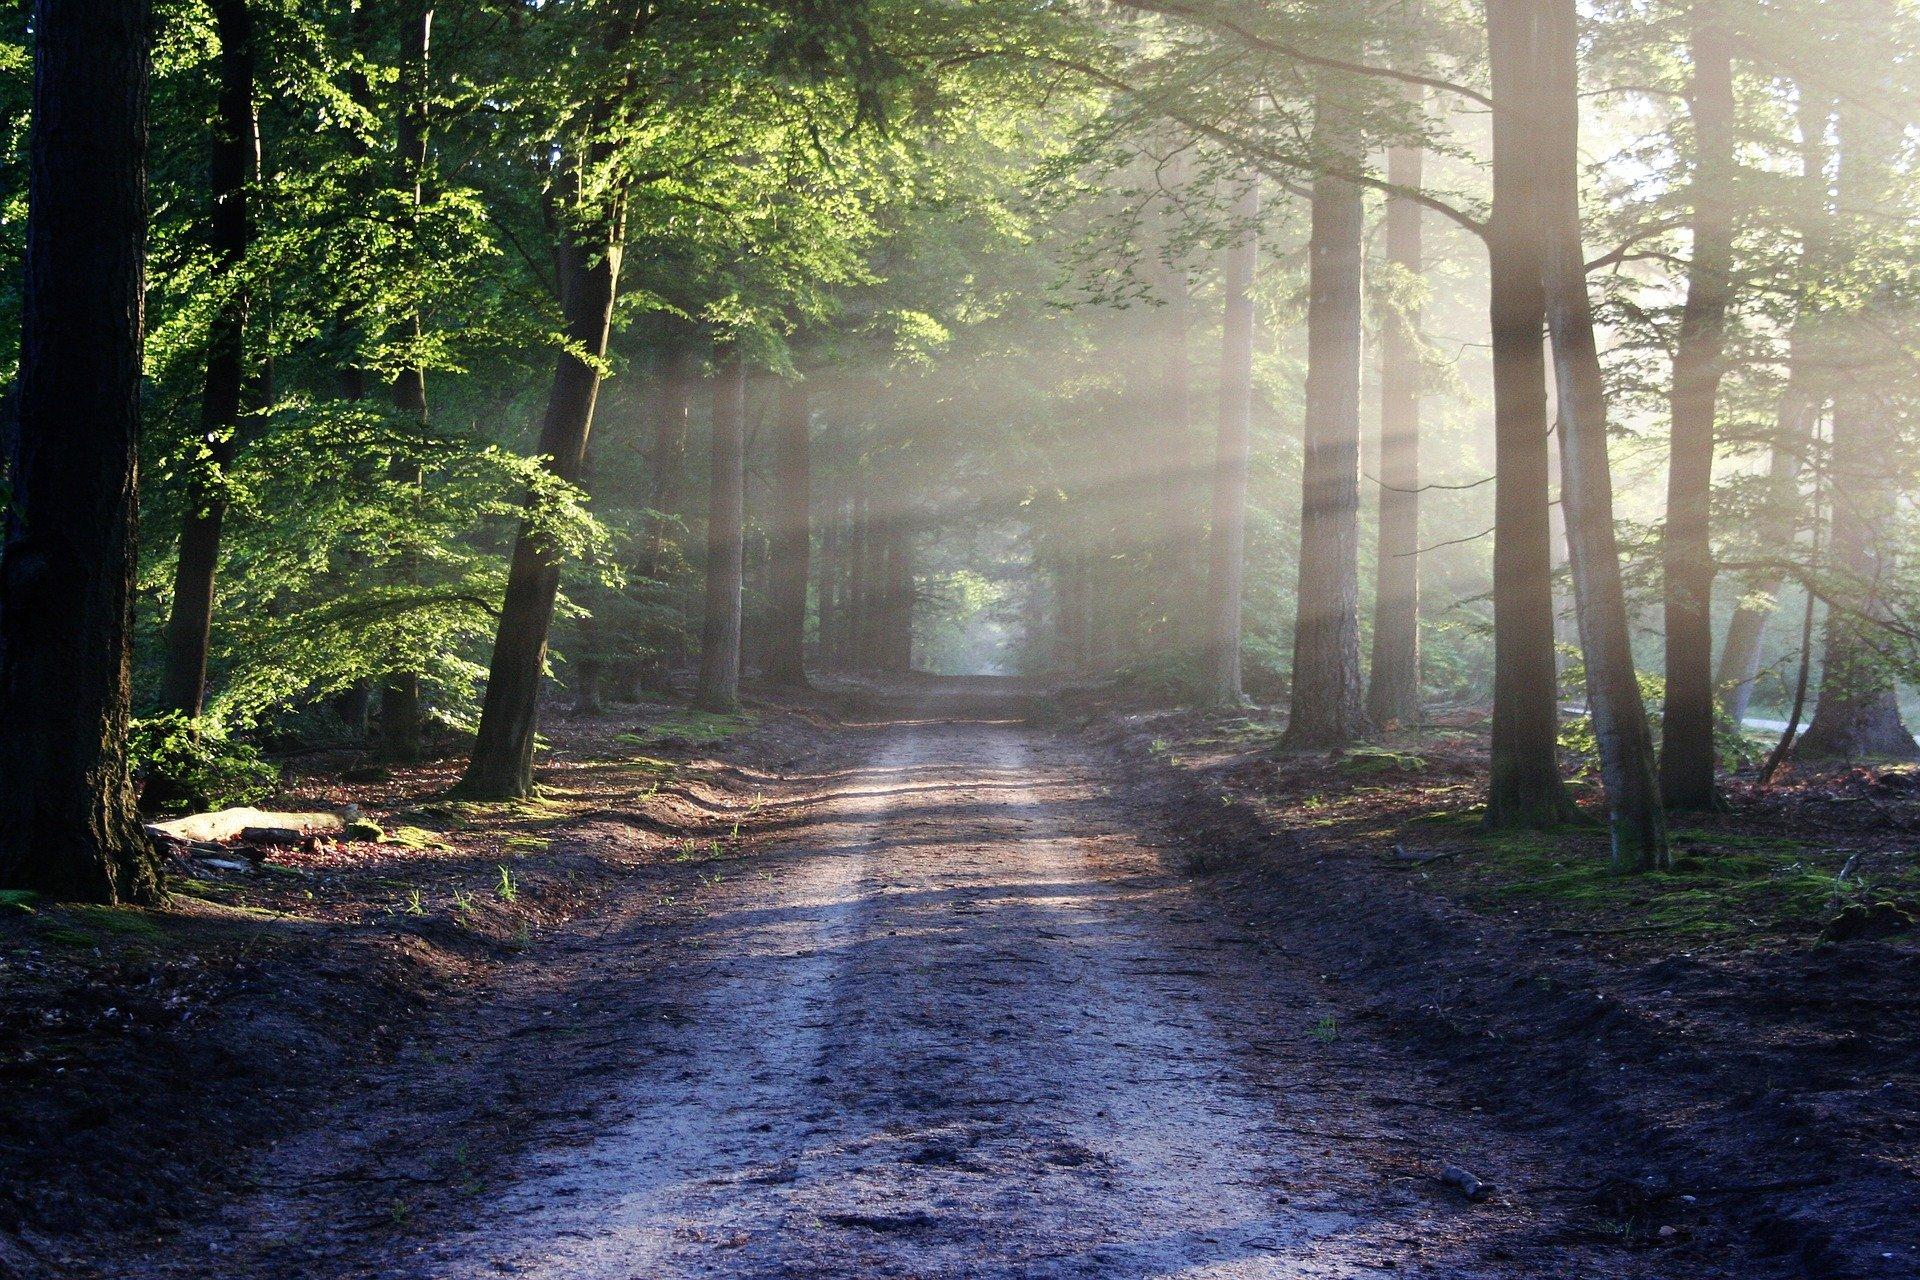 The Road to Faithfulness